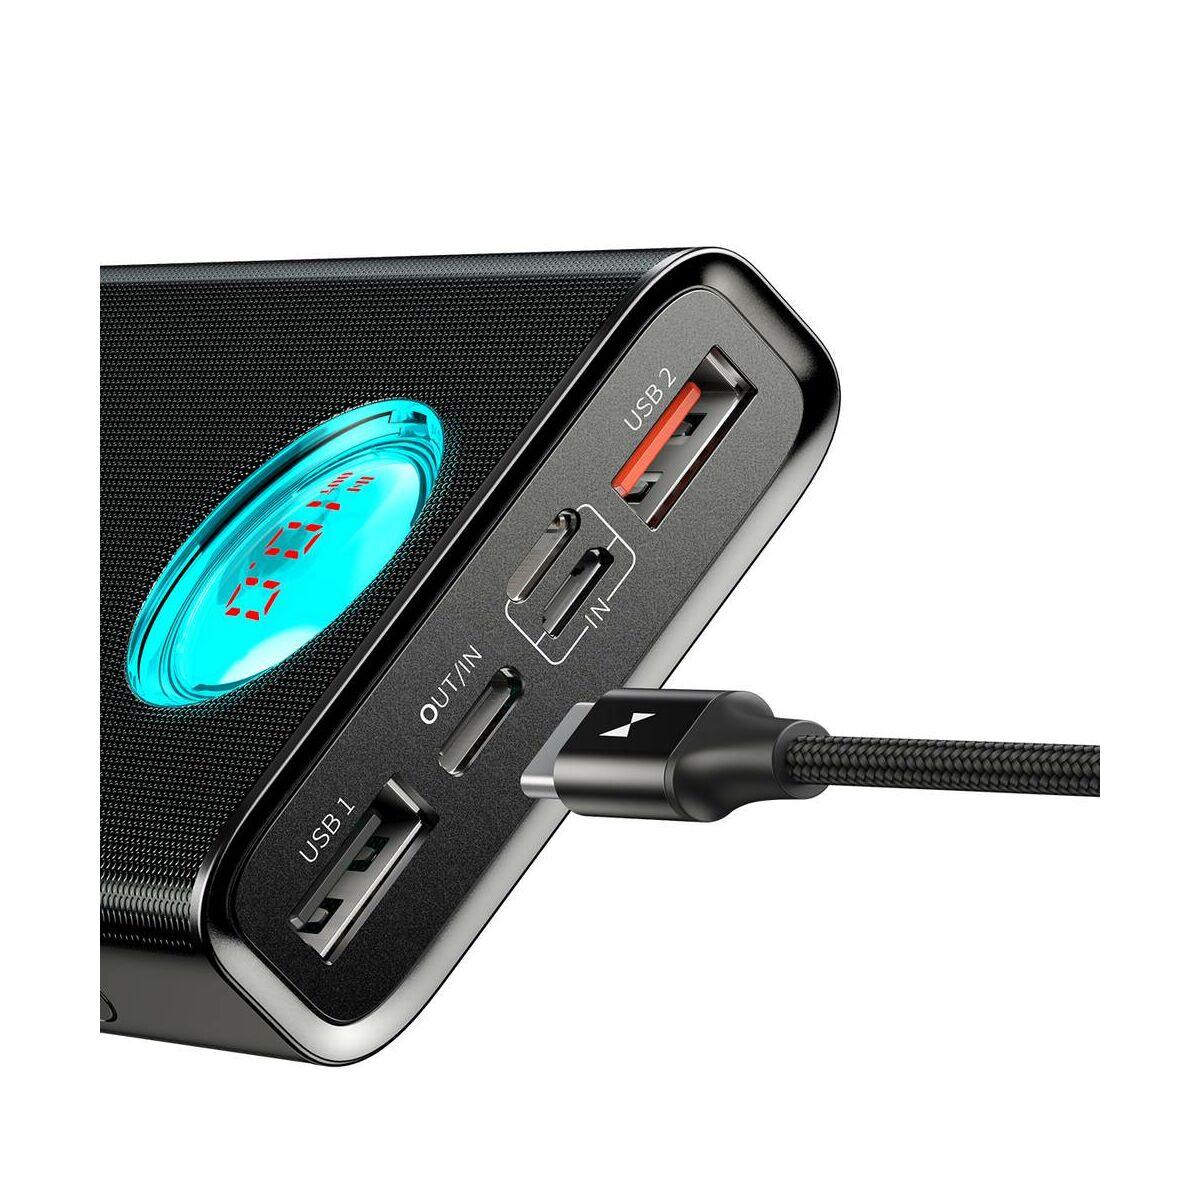 Baseus Power Bank Amblight kijelzővel (PD3.0, QC3.0) 18W 20000 mAh, fekete (PPALL-LG01)